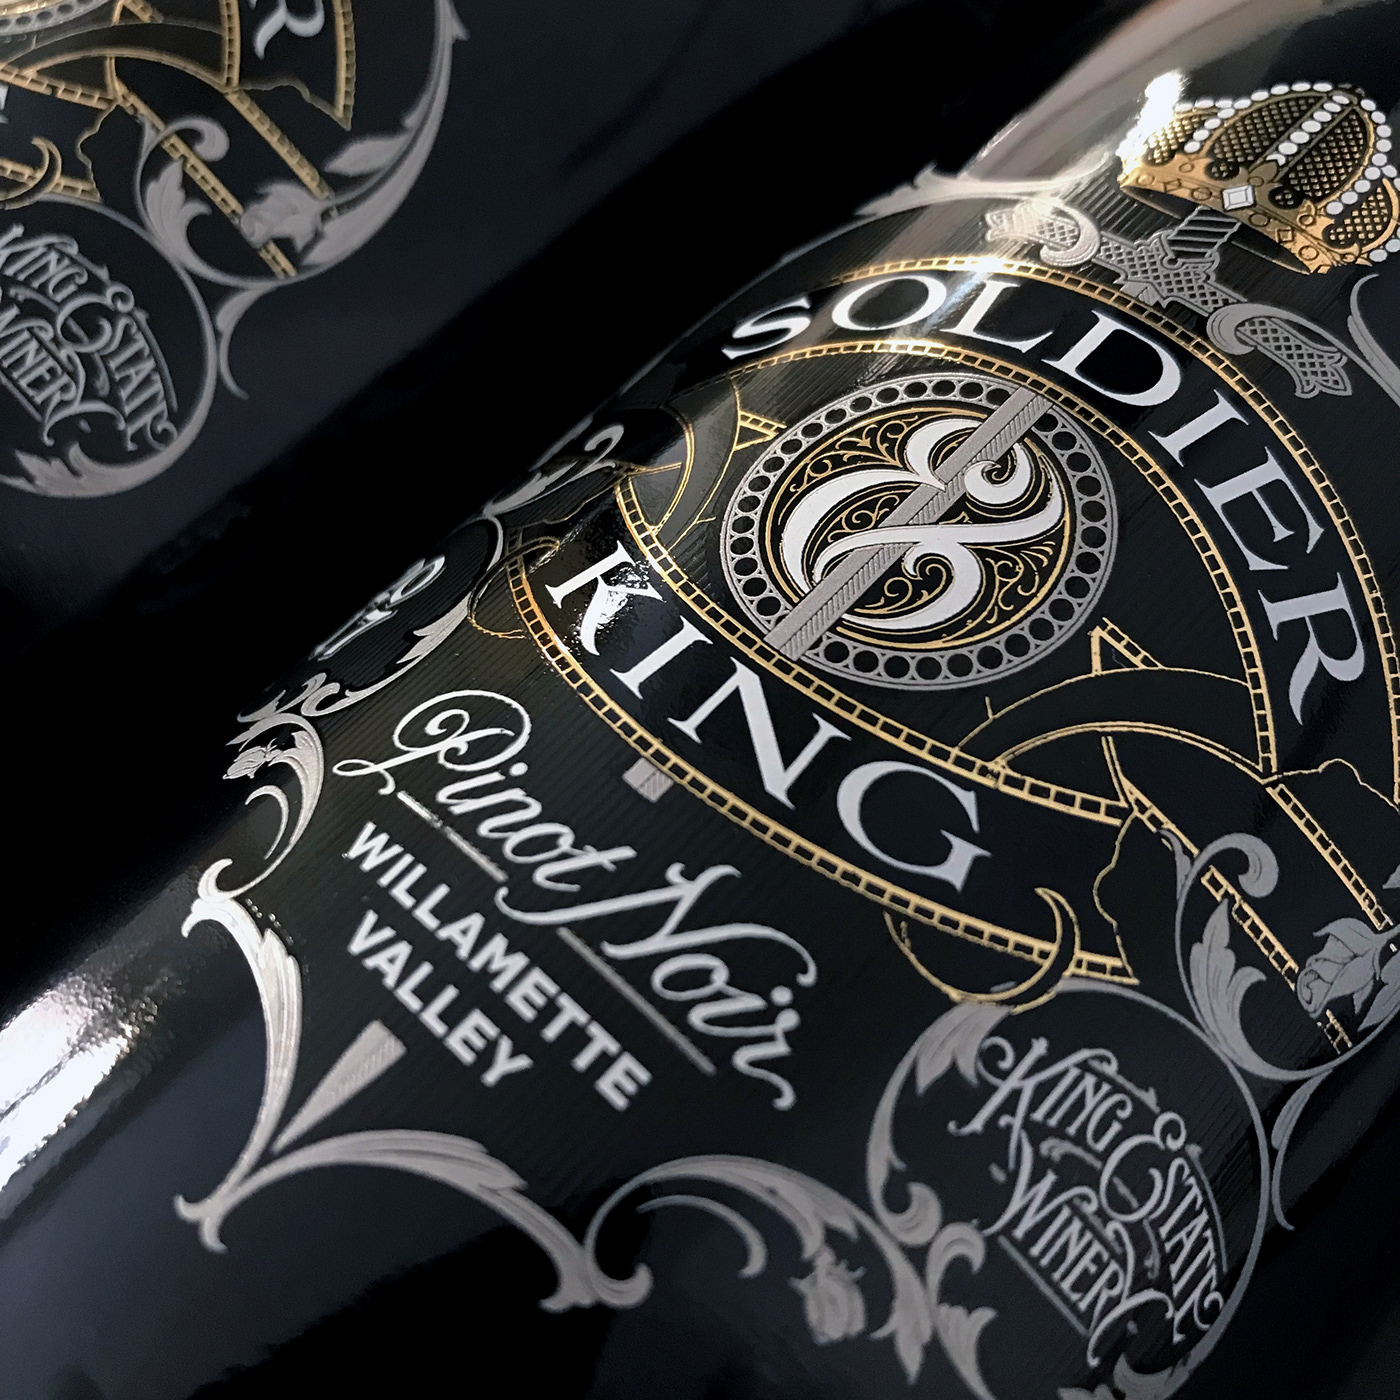 schmetzer soldier & king wine Label design Packaging screen printed King Estate pinot noir